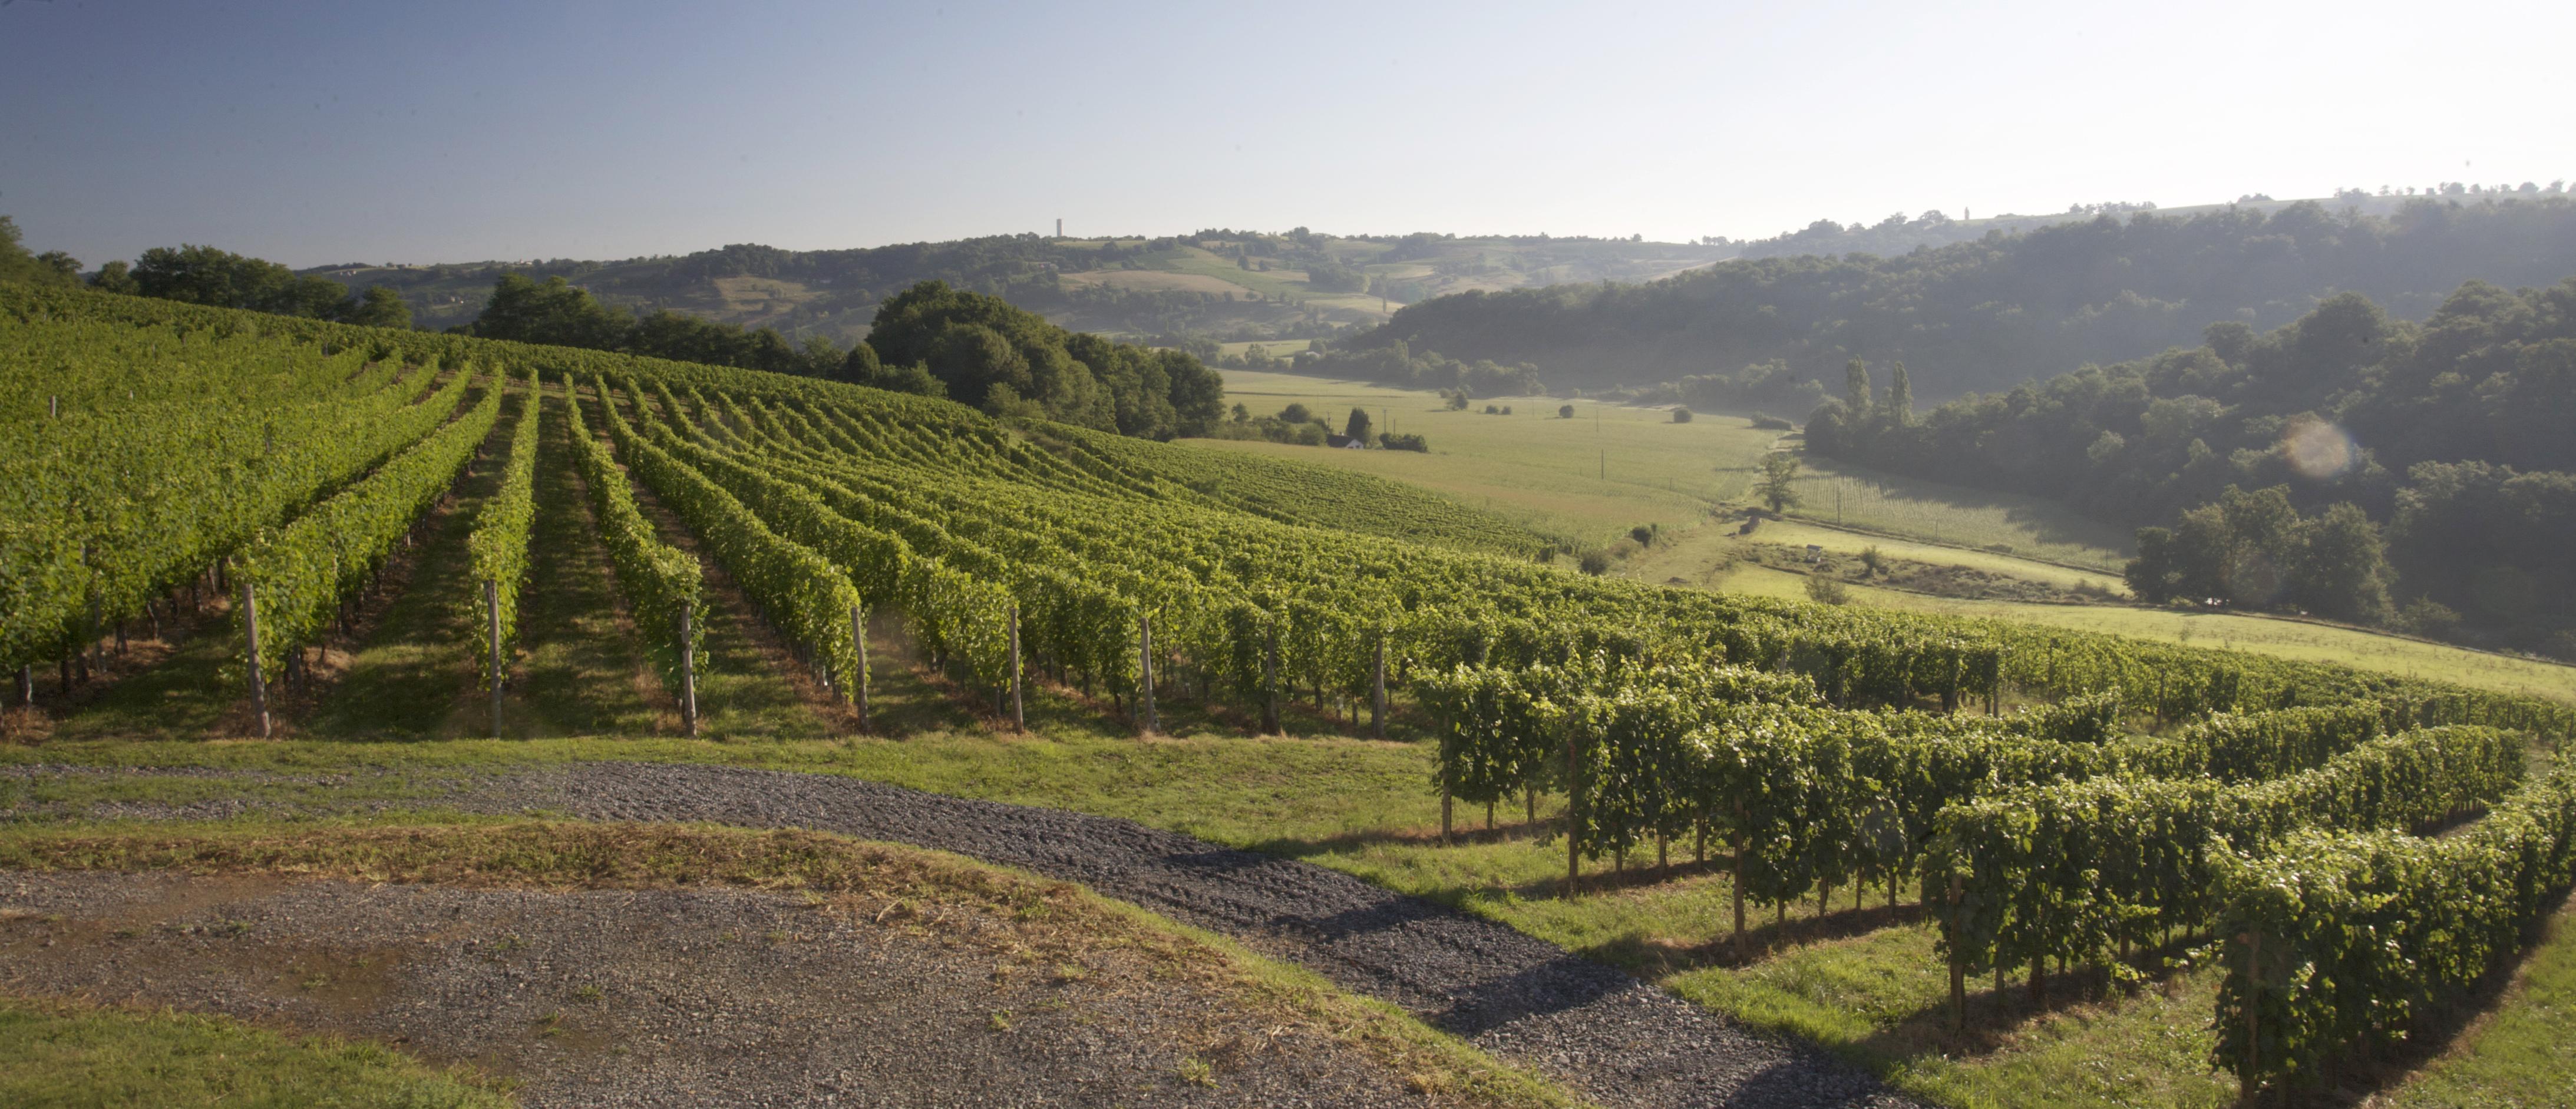 Vignoble Domaine Montesquiou - Vin jurancon - Monein